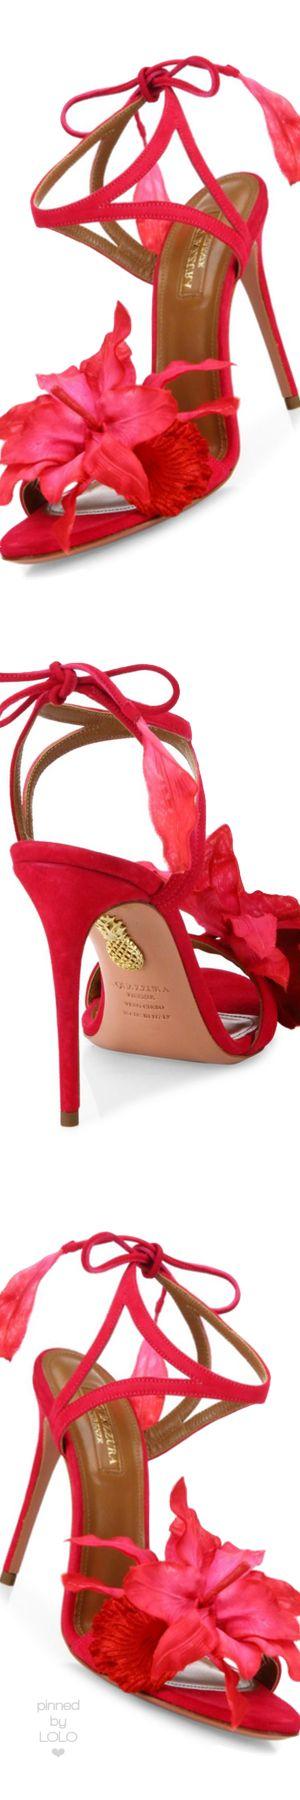 Aquazzura Flora Suede Back-Tie Sandals Paradise Pink